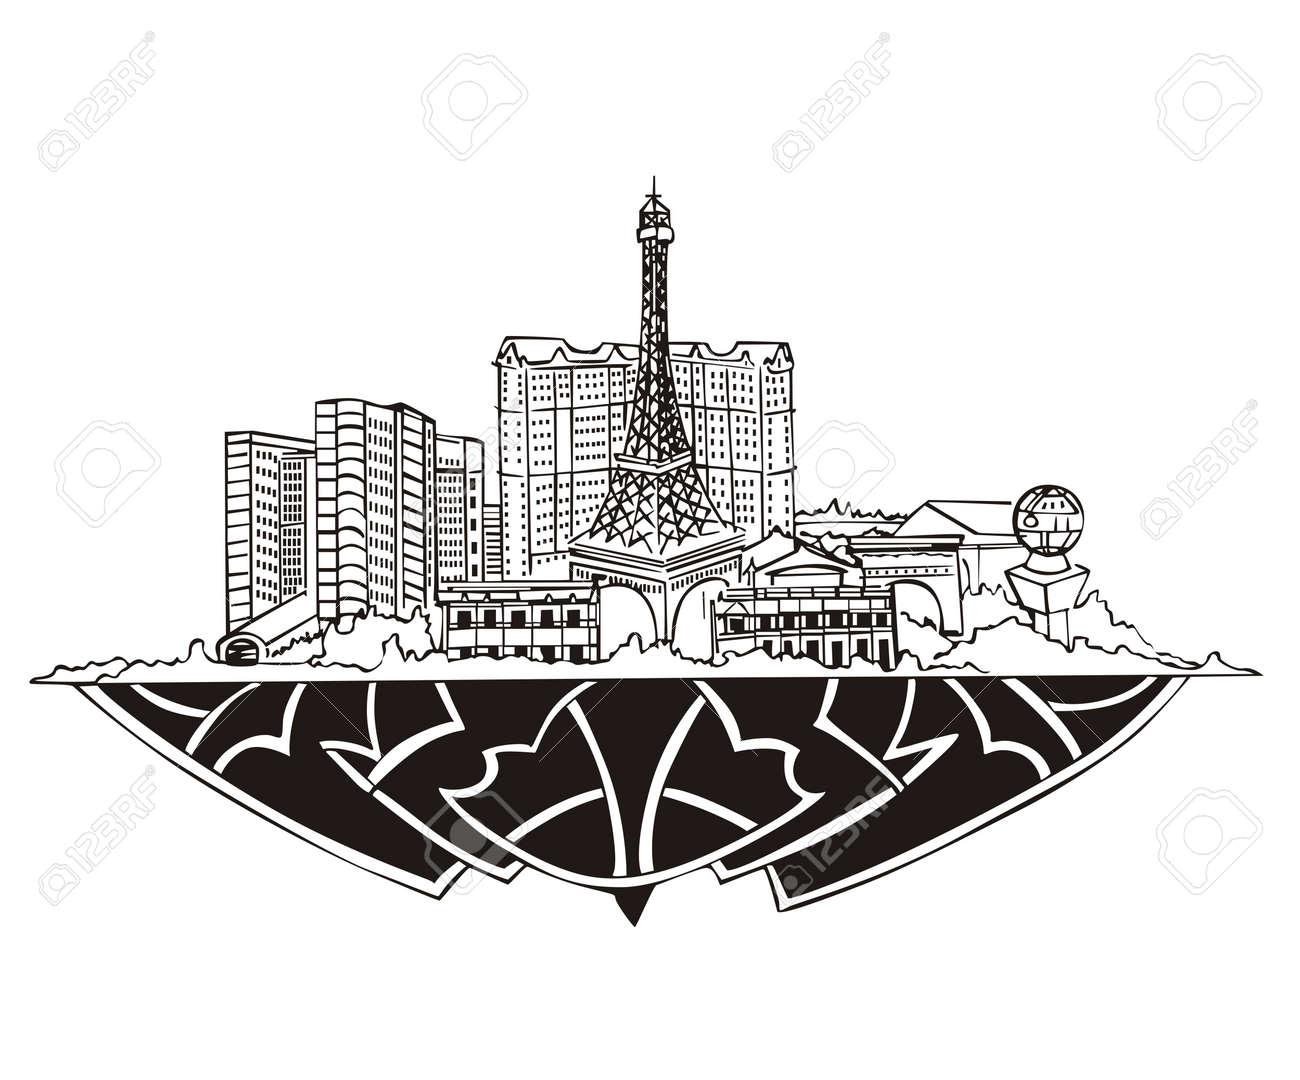 Las Vegas Nv Skyline Black And White Royalty Free Cliparts